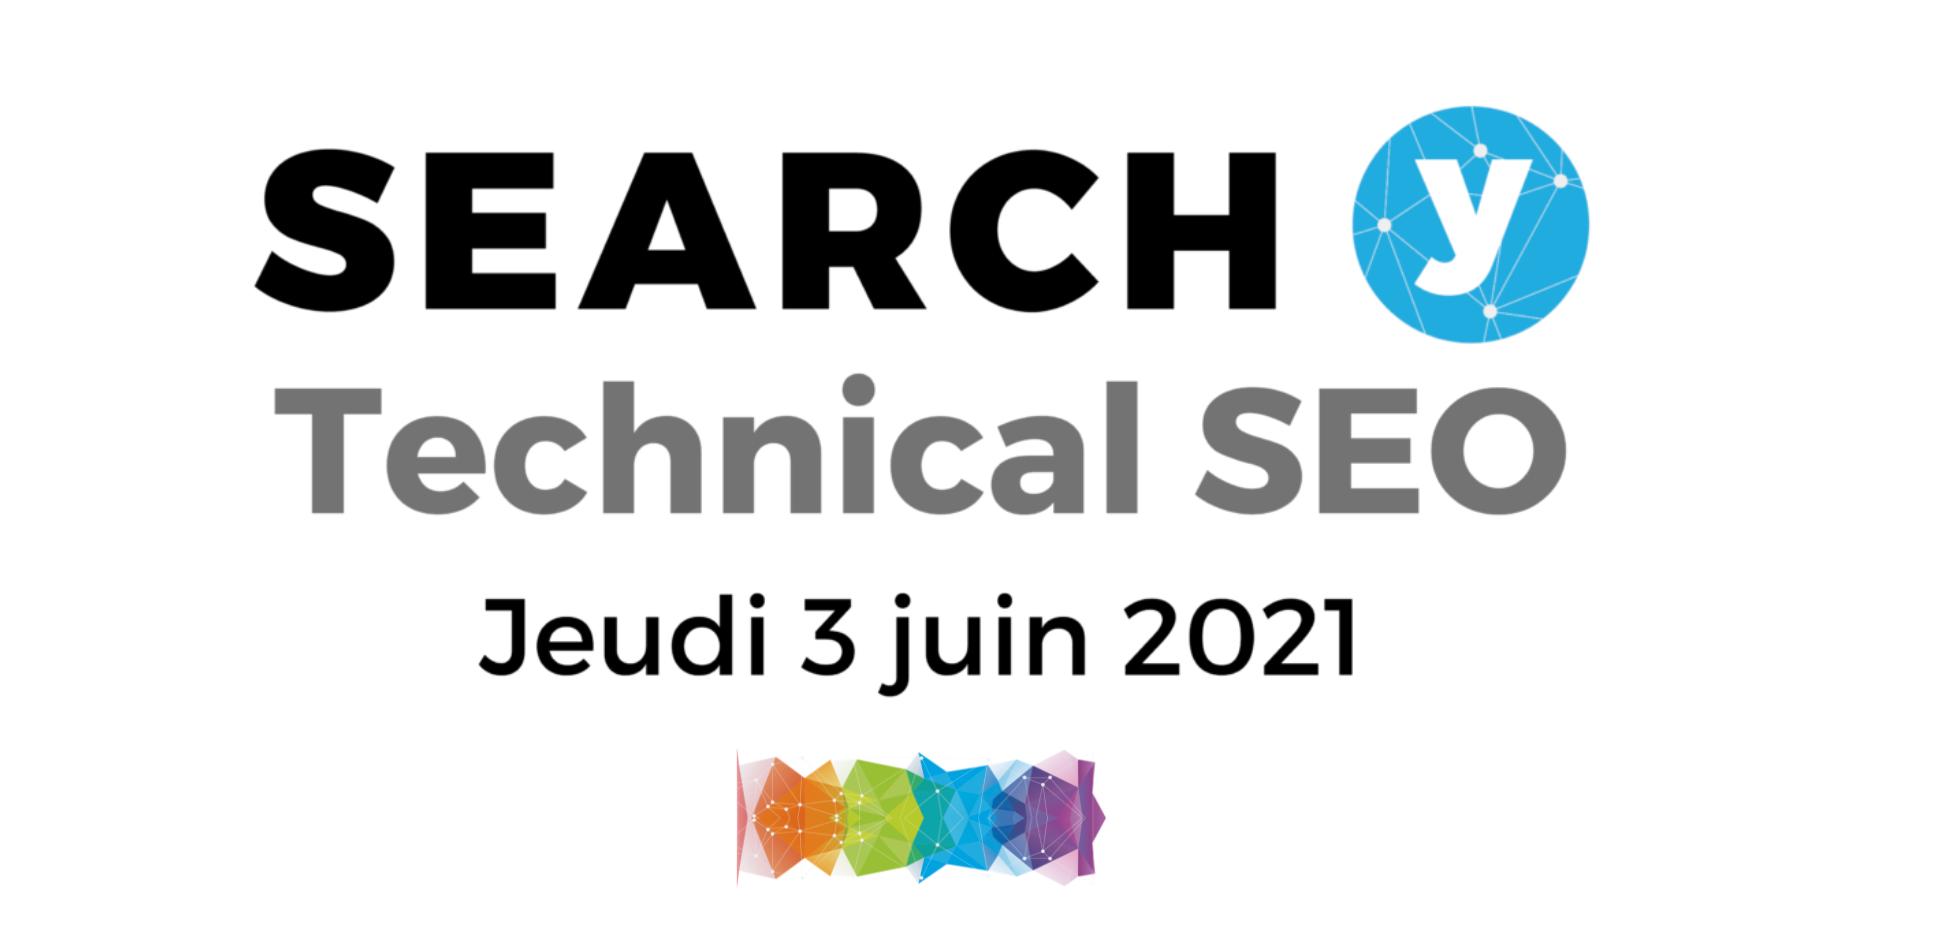 Search Y Technical SEO 2021